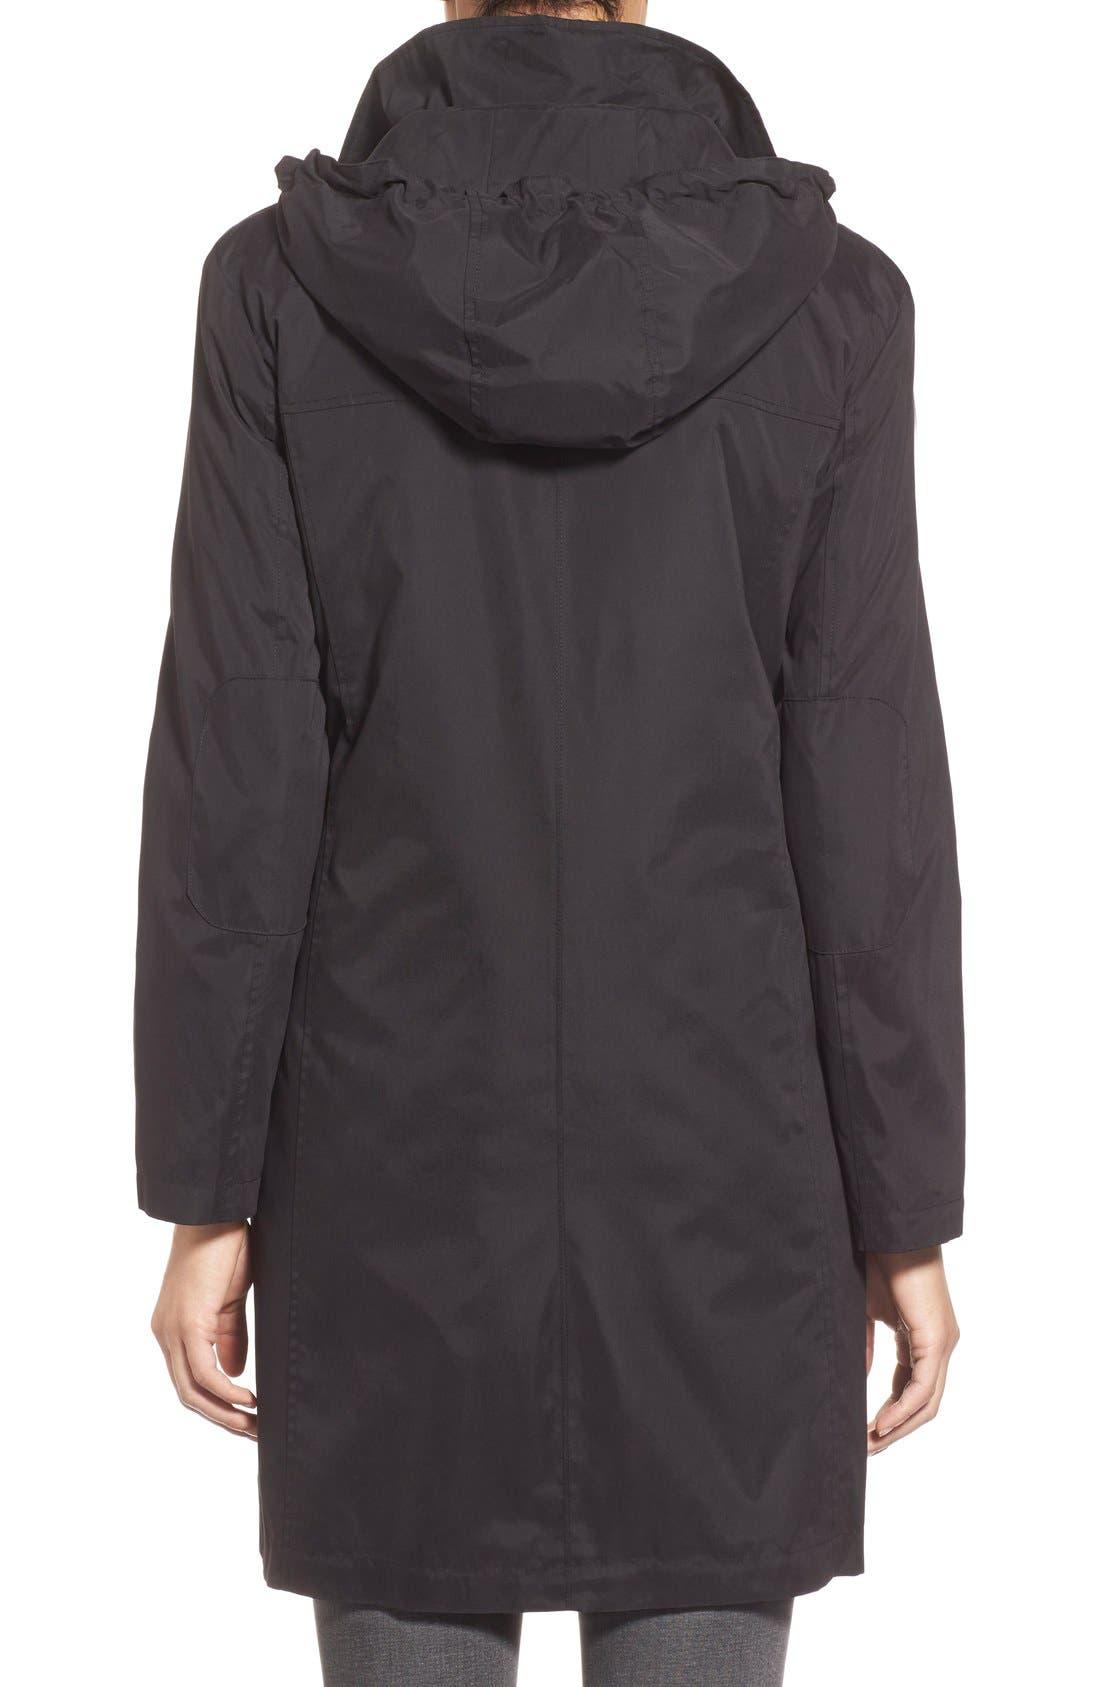 A-Line Raincoat with Detachable Hood,                             Alternate thumbnail 2, color,                             001